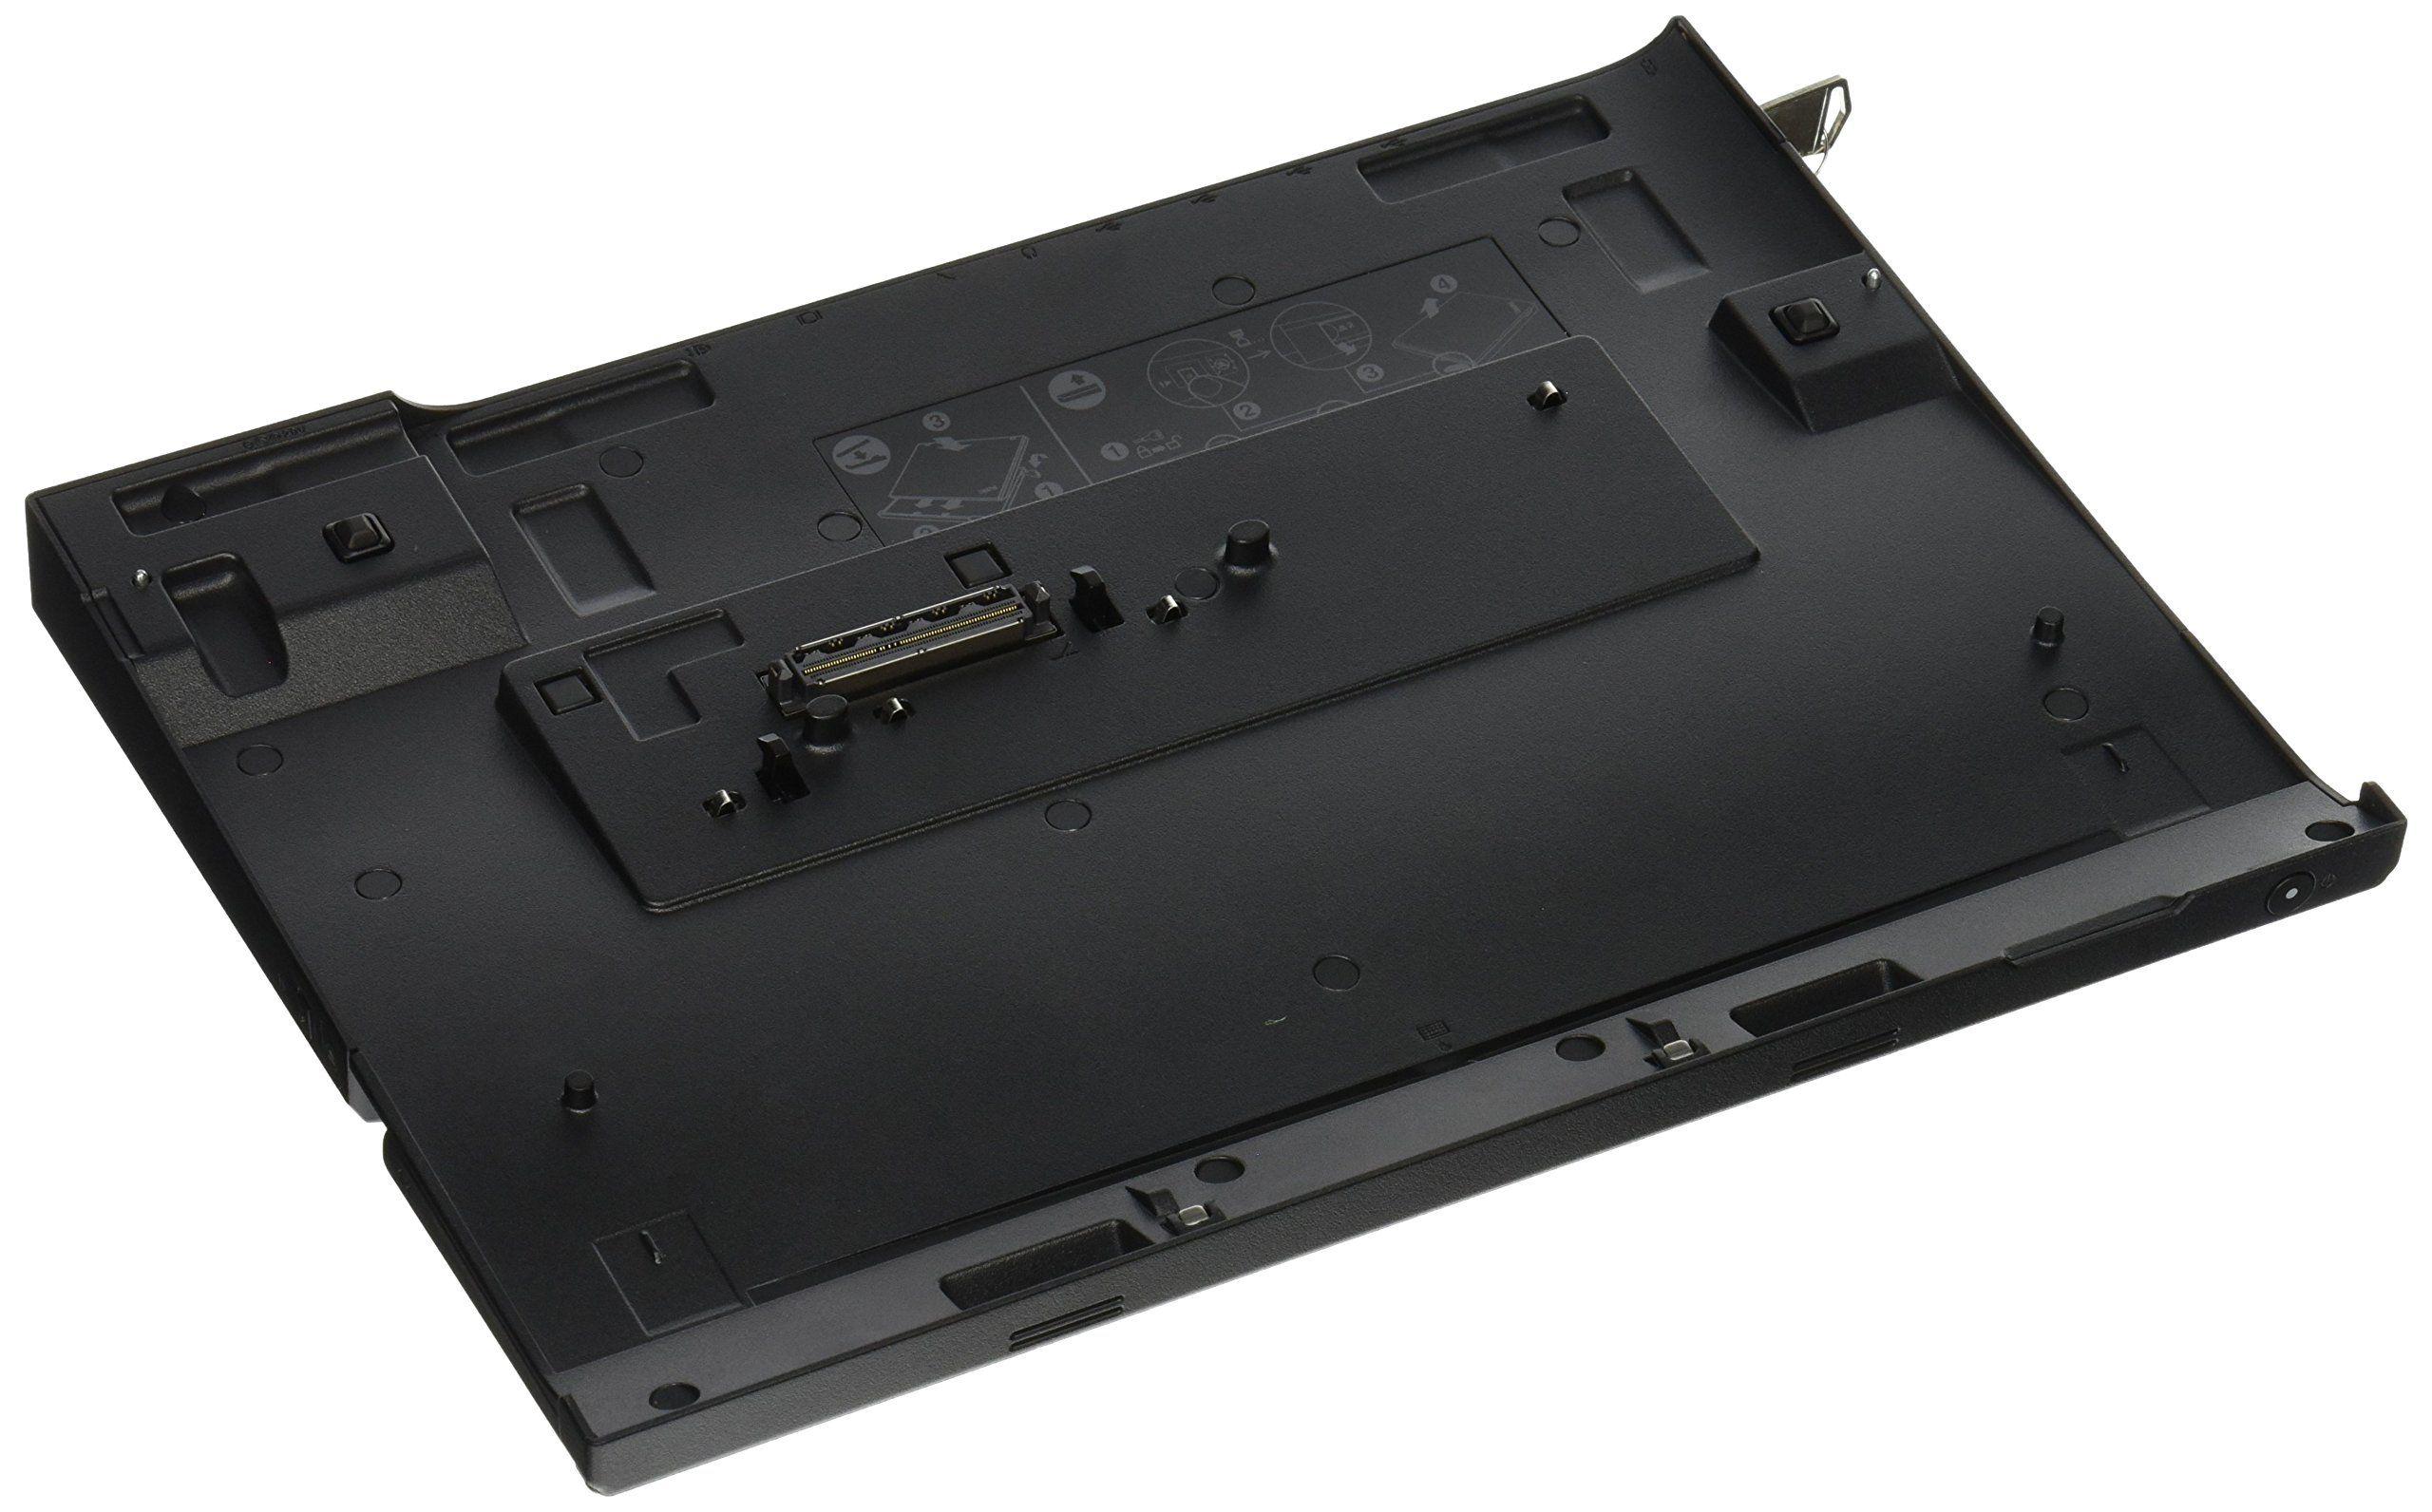 Lenovo Thinkpad X220 / X230 Ultrabase, Docking Station 04W6846